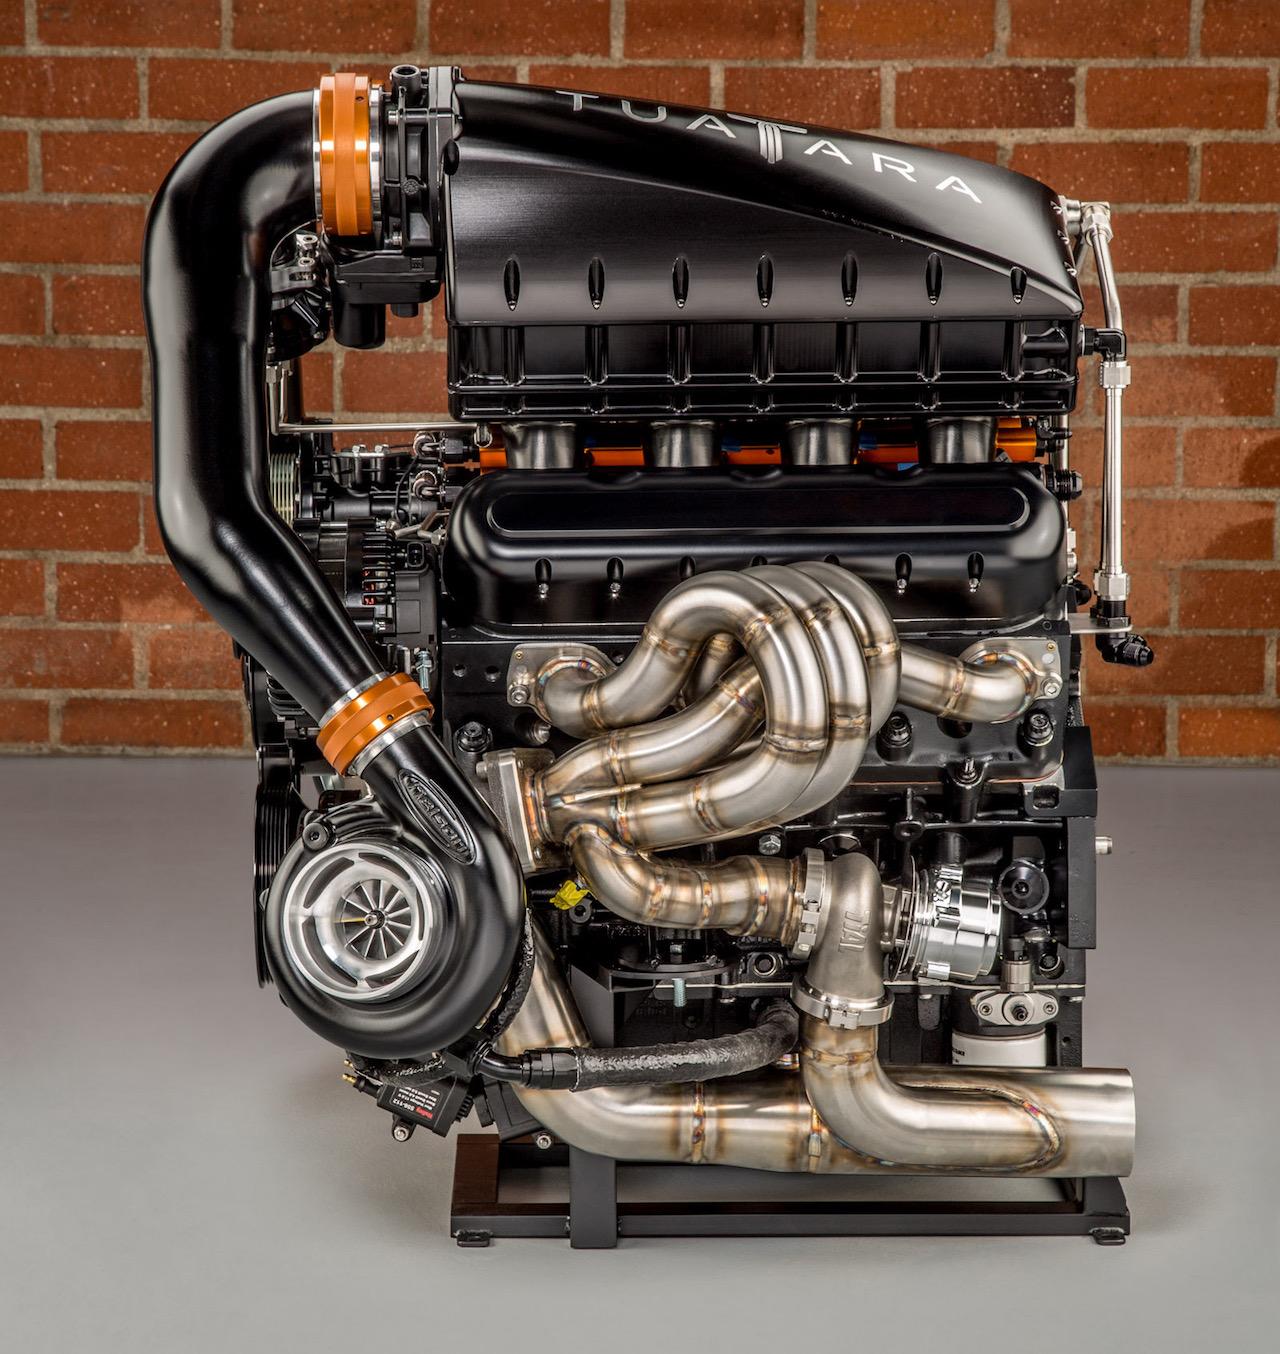 Ssc Tuatara Teasers Show Extreme Twin Turbo V8 Engine